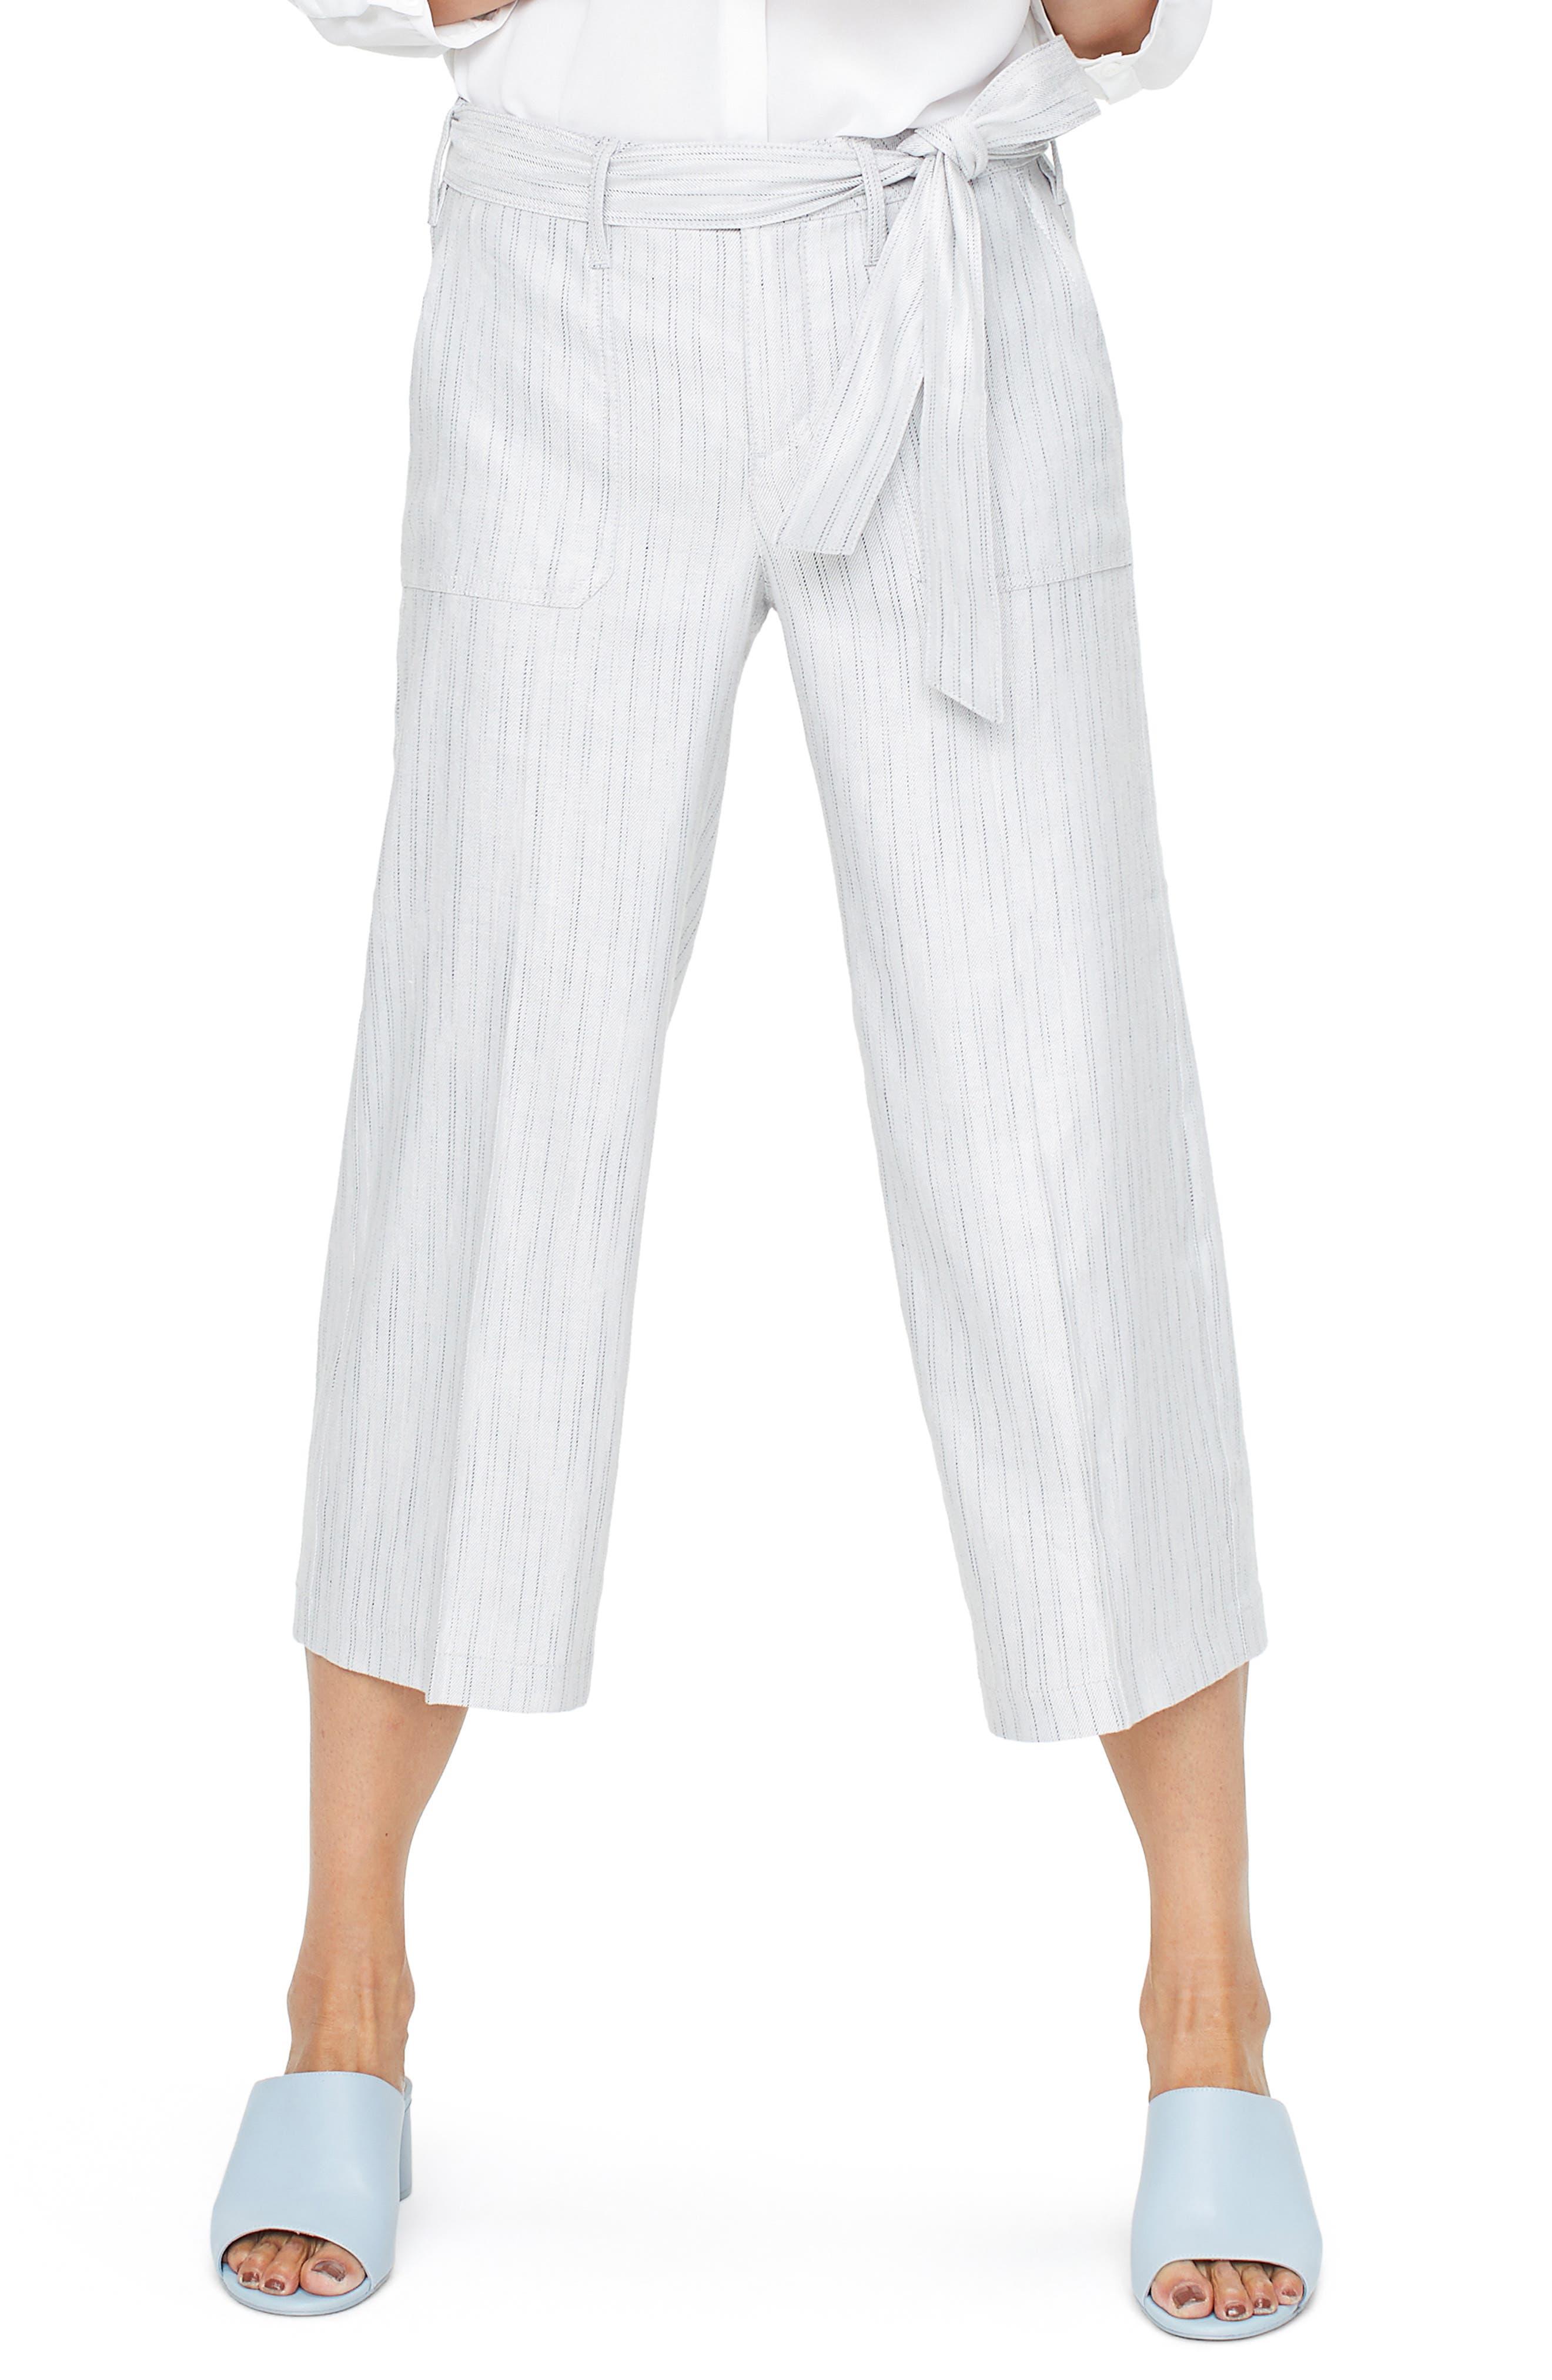 Nydj Cargo Capri Pants, Grey